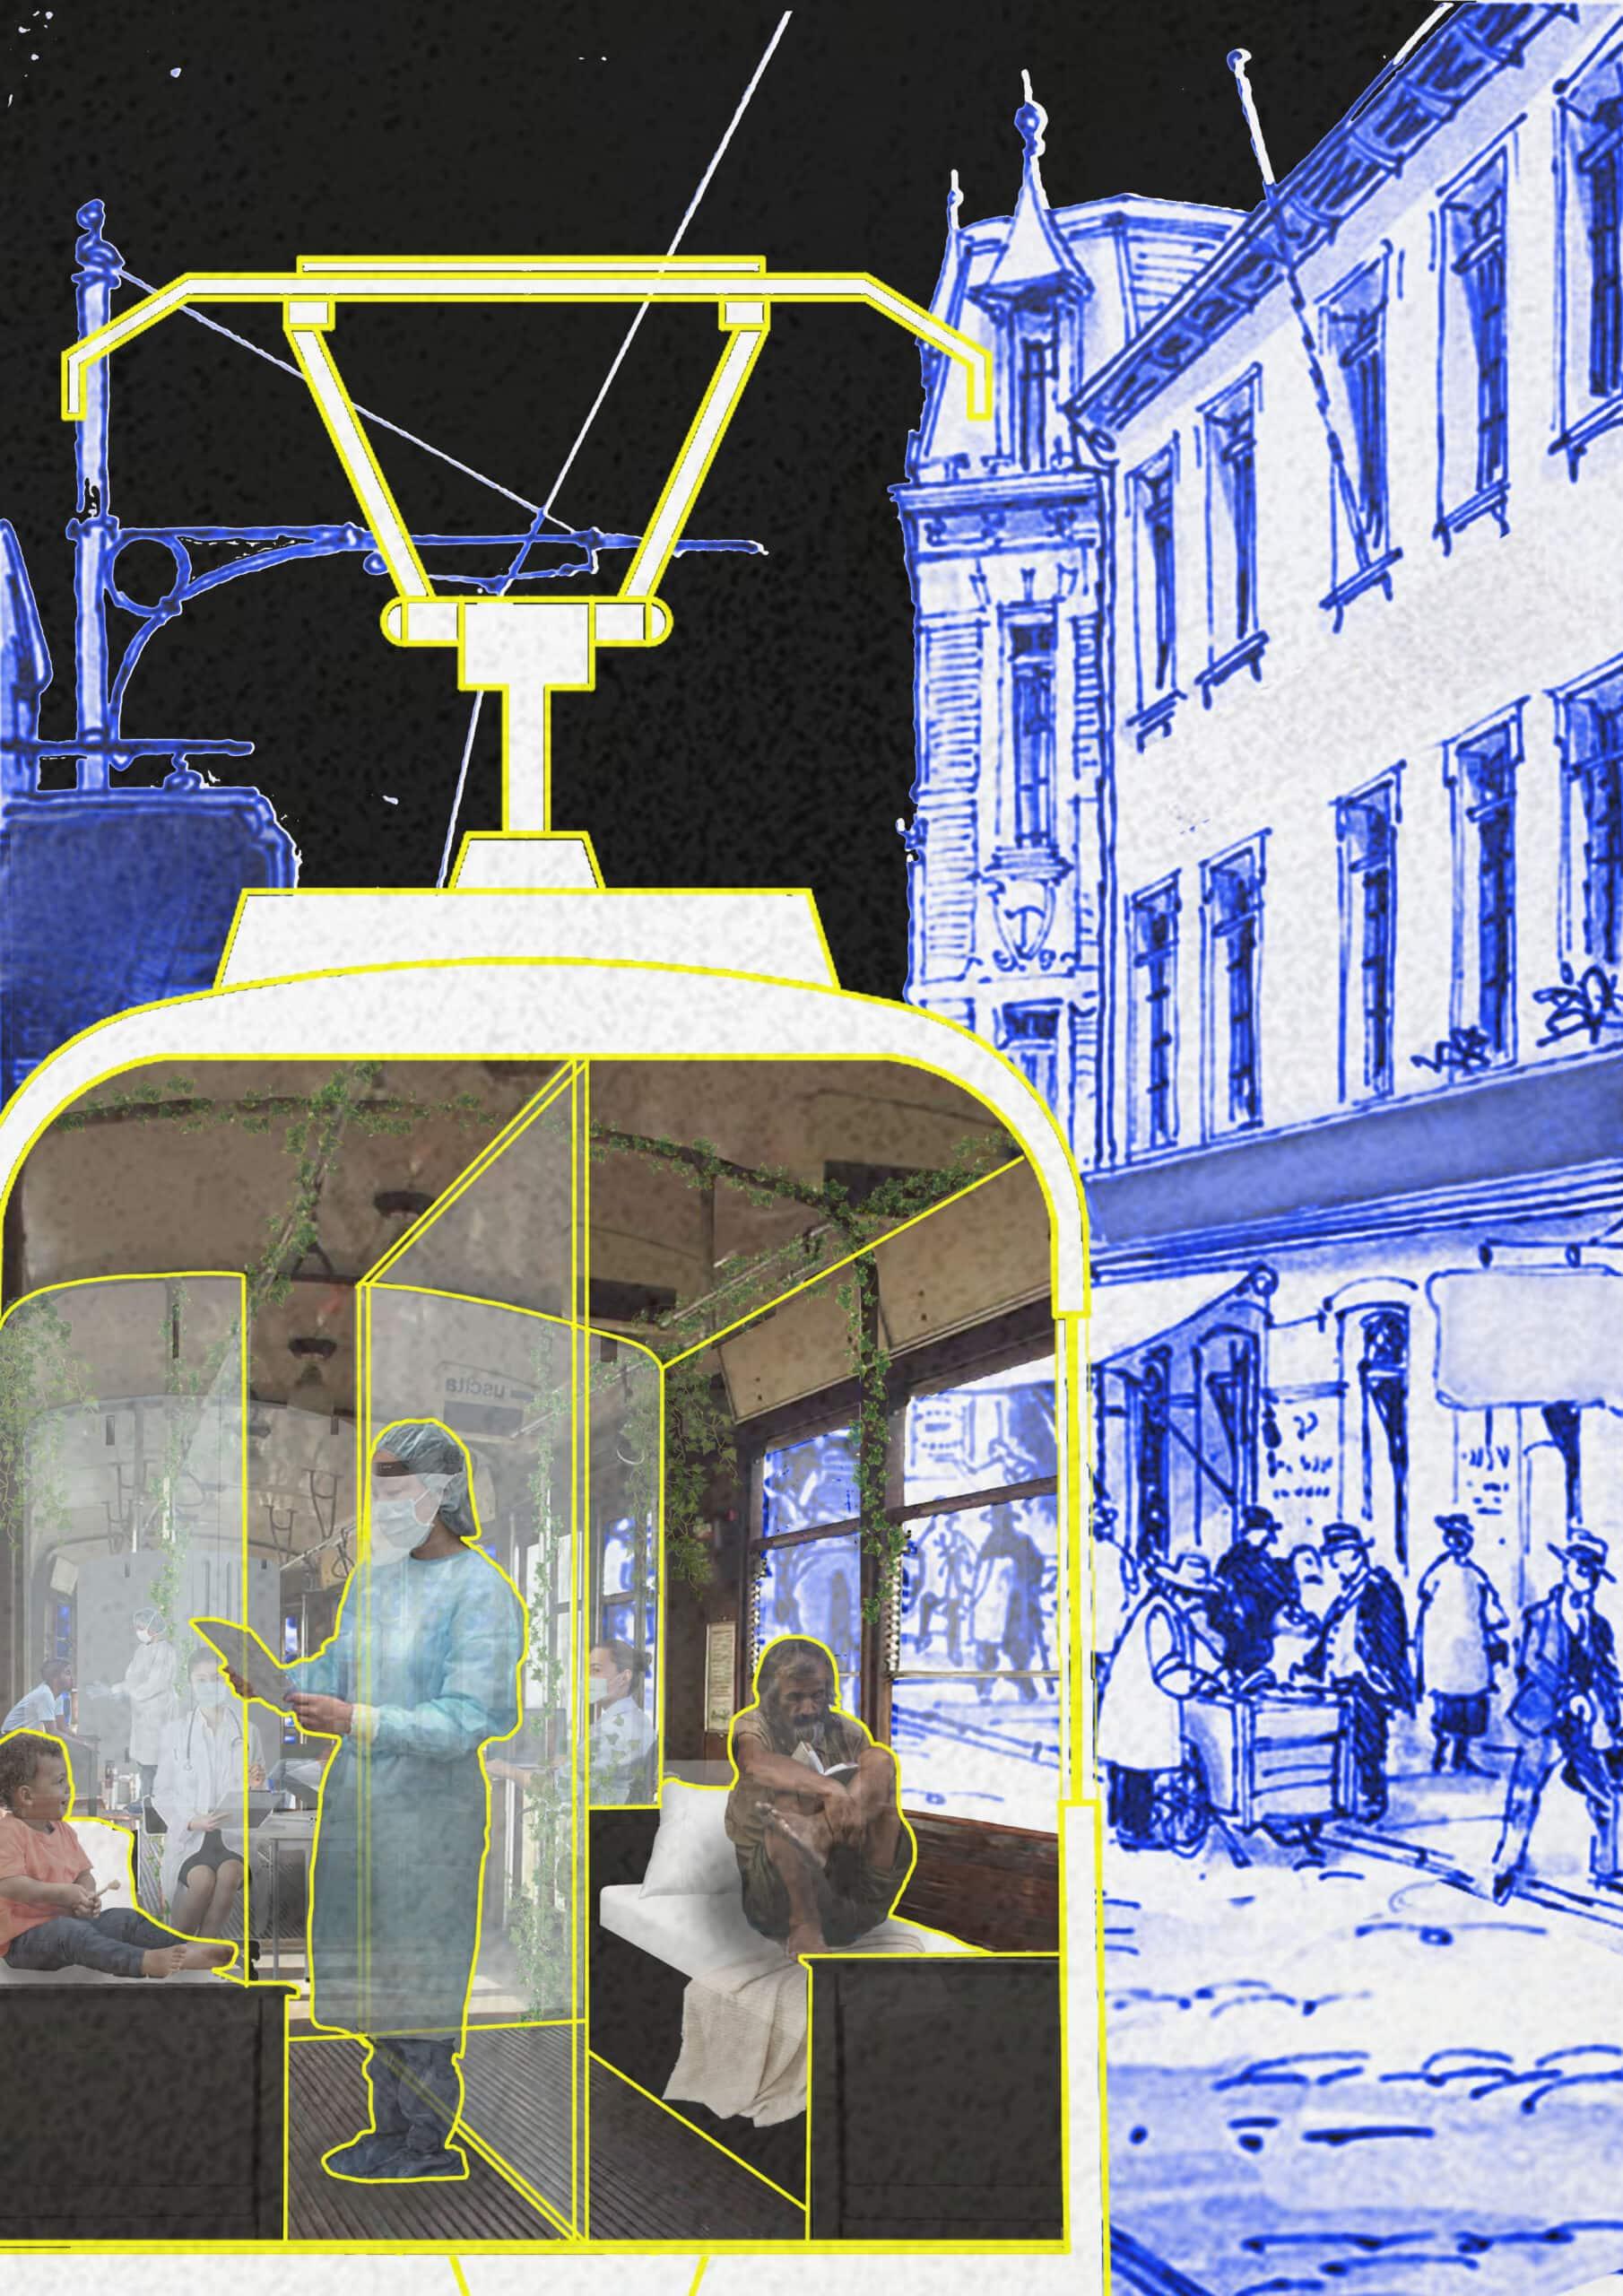 18268_Sanitizing tram_Presentation